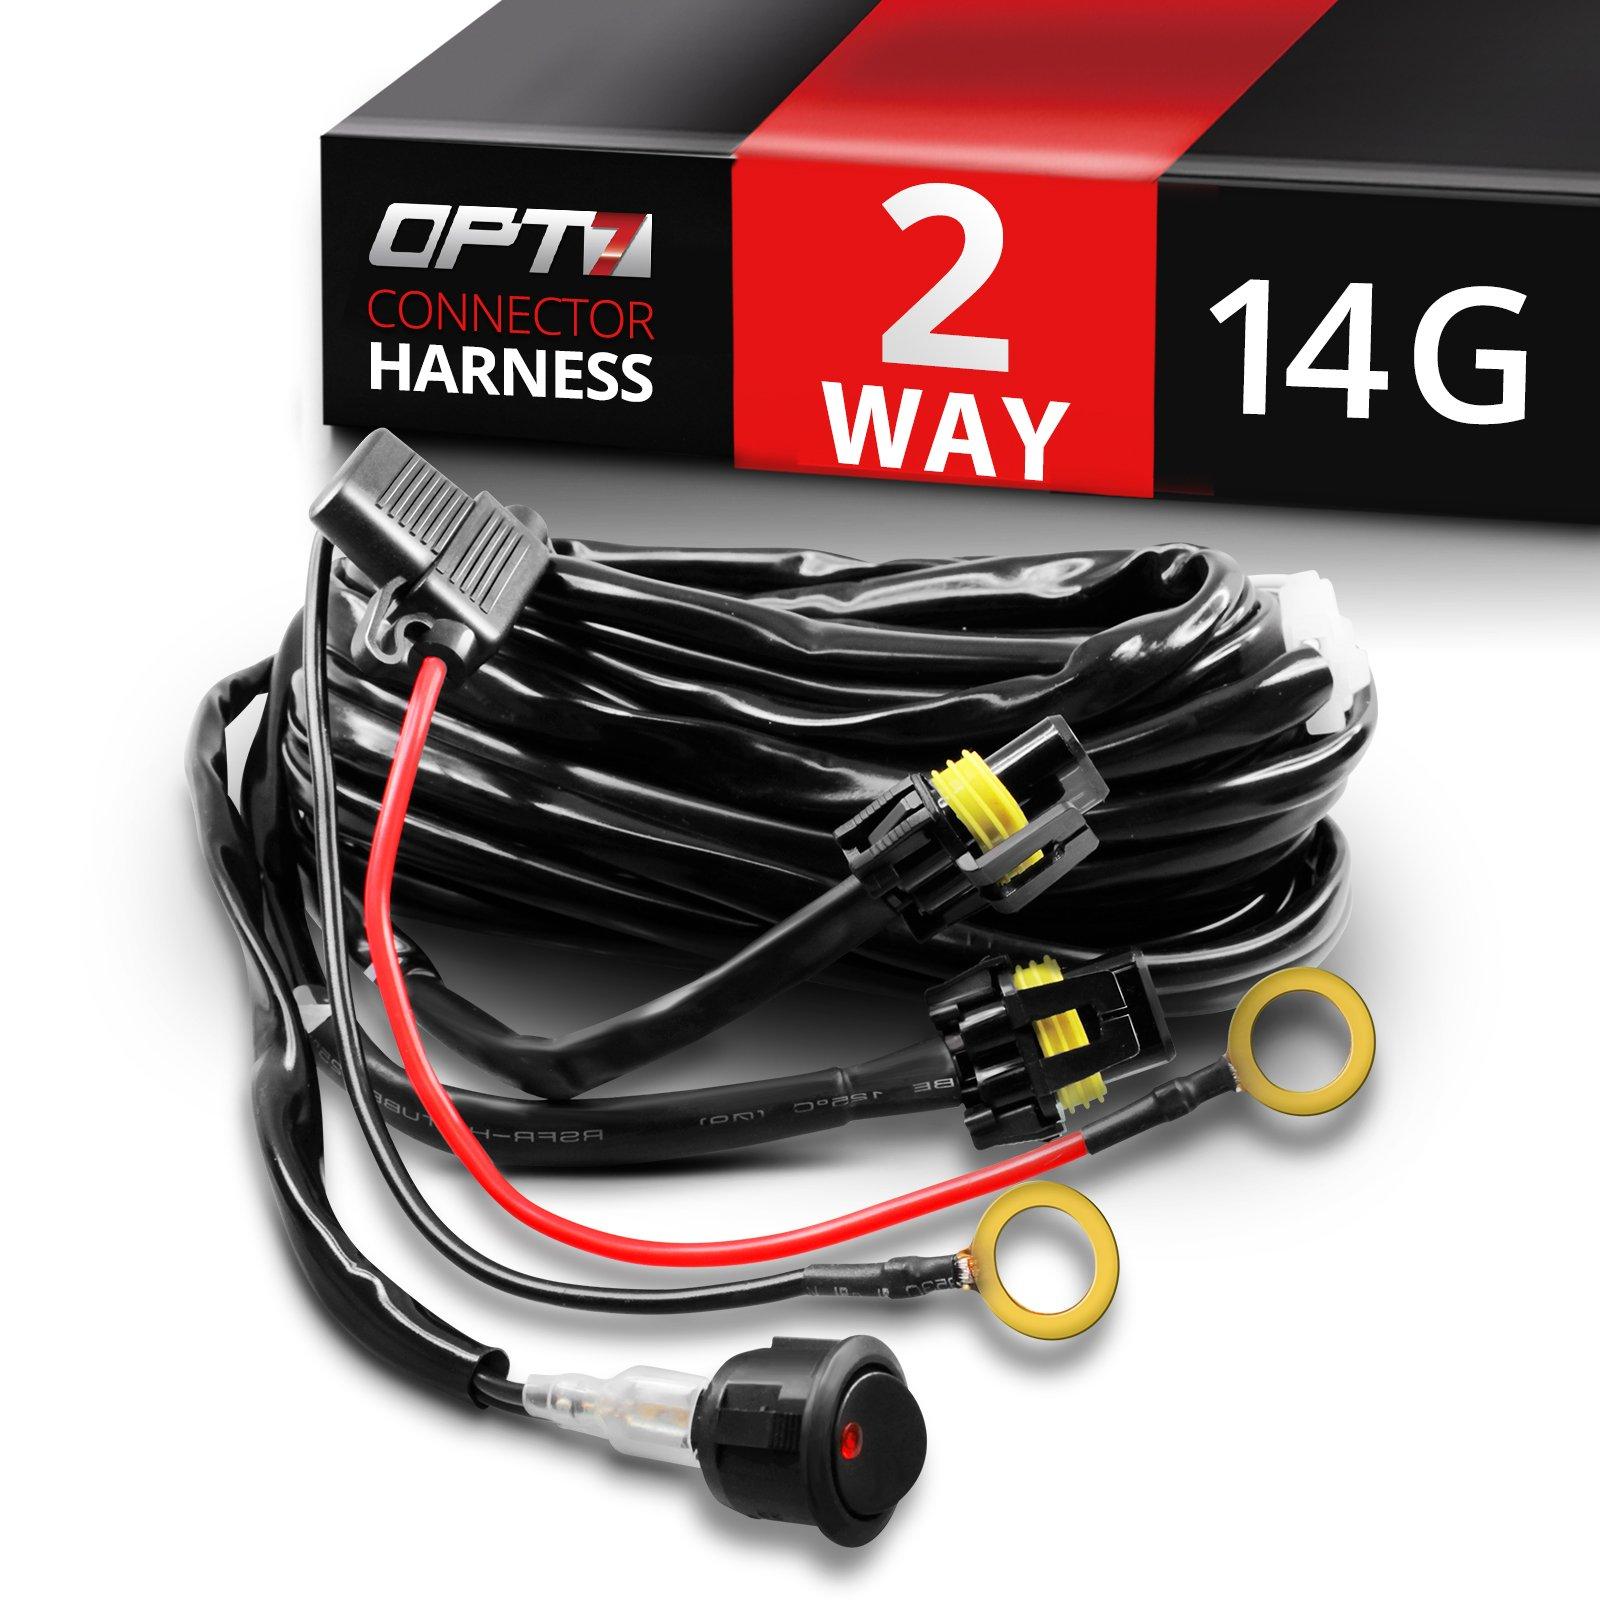 Off Road Lights Wiring Kits Jeep Jk Fog Light Harness Led Plug And Play Kit Amazon Com